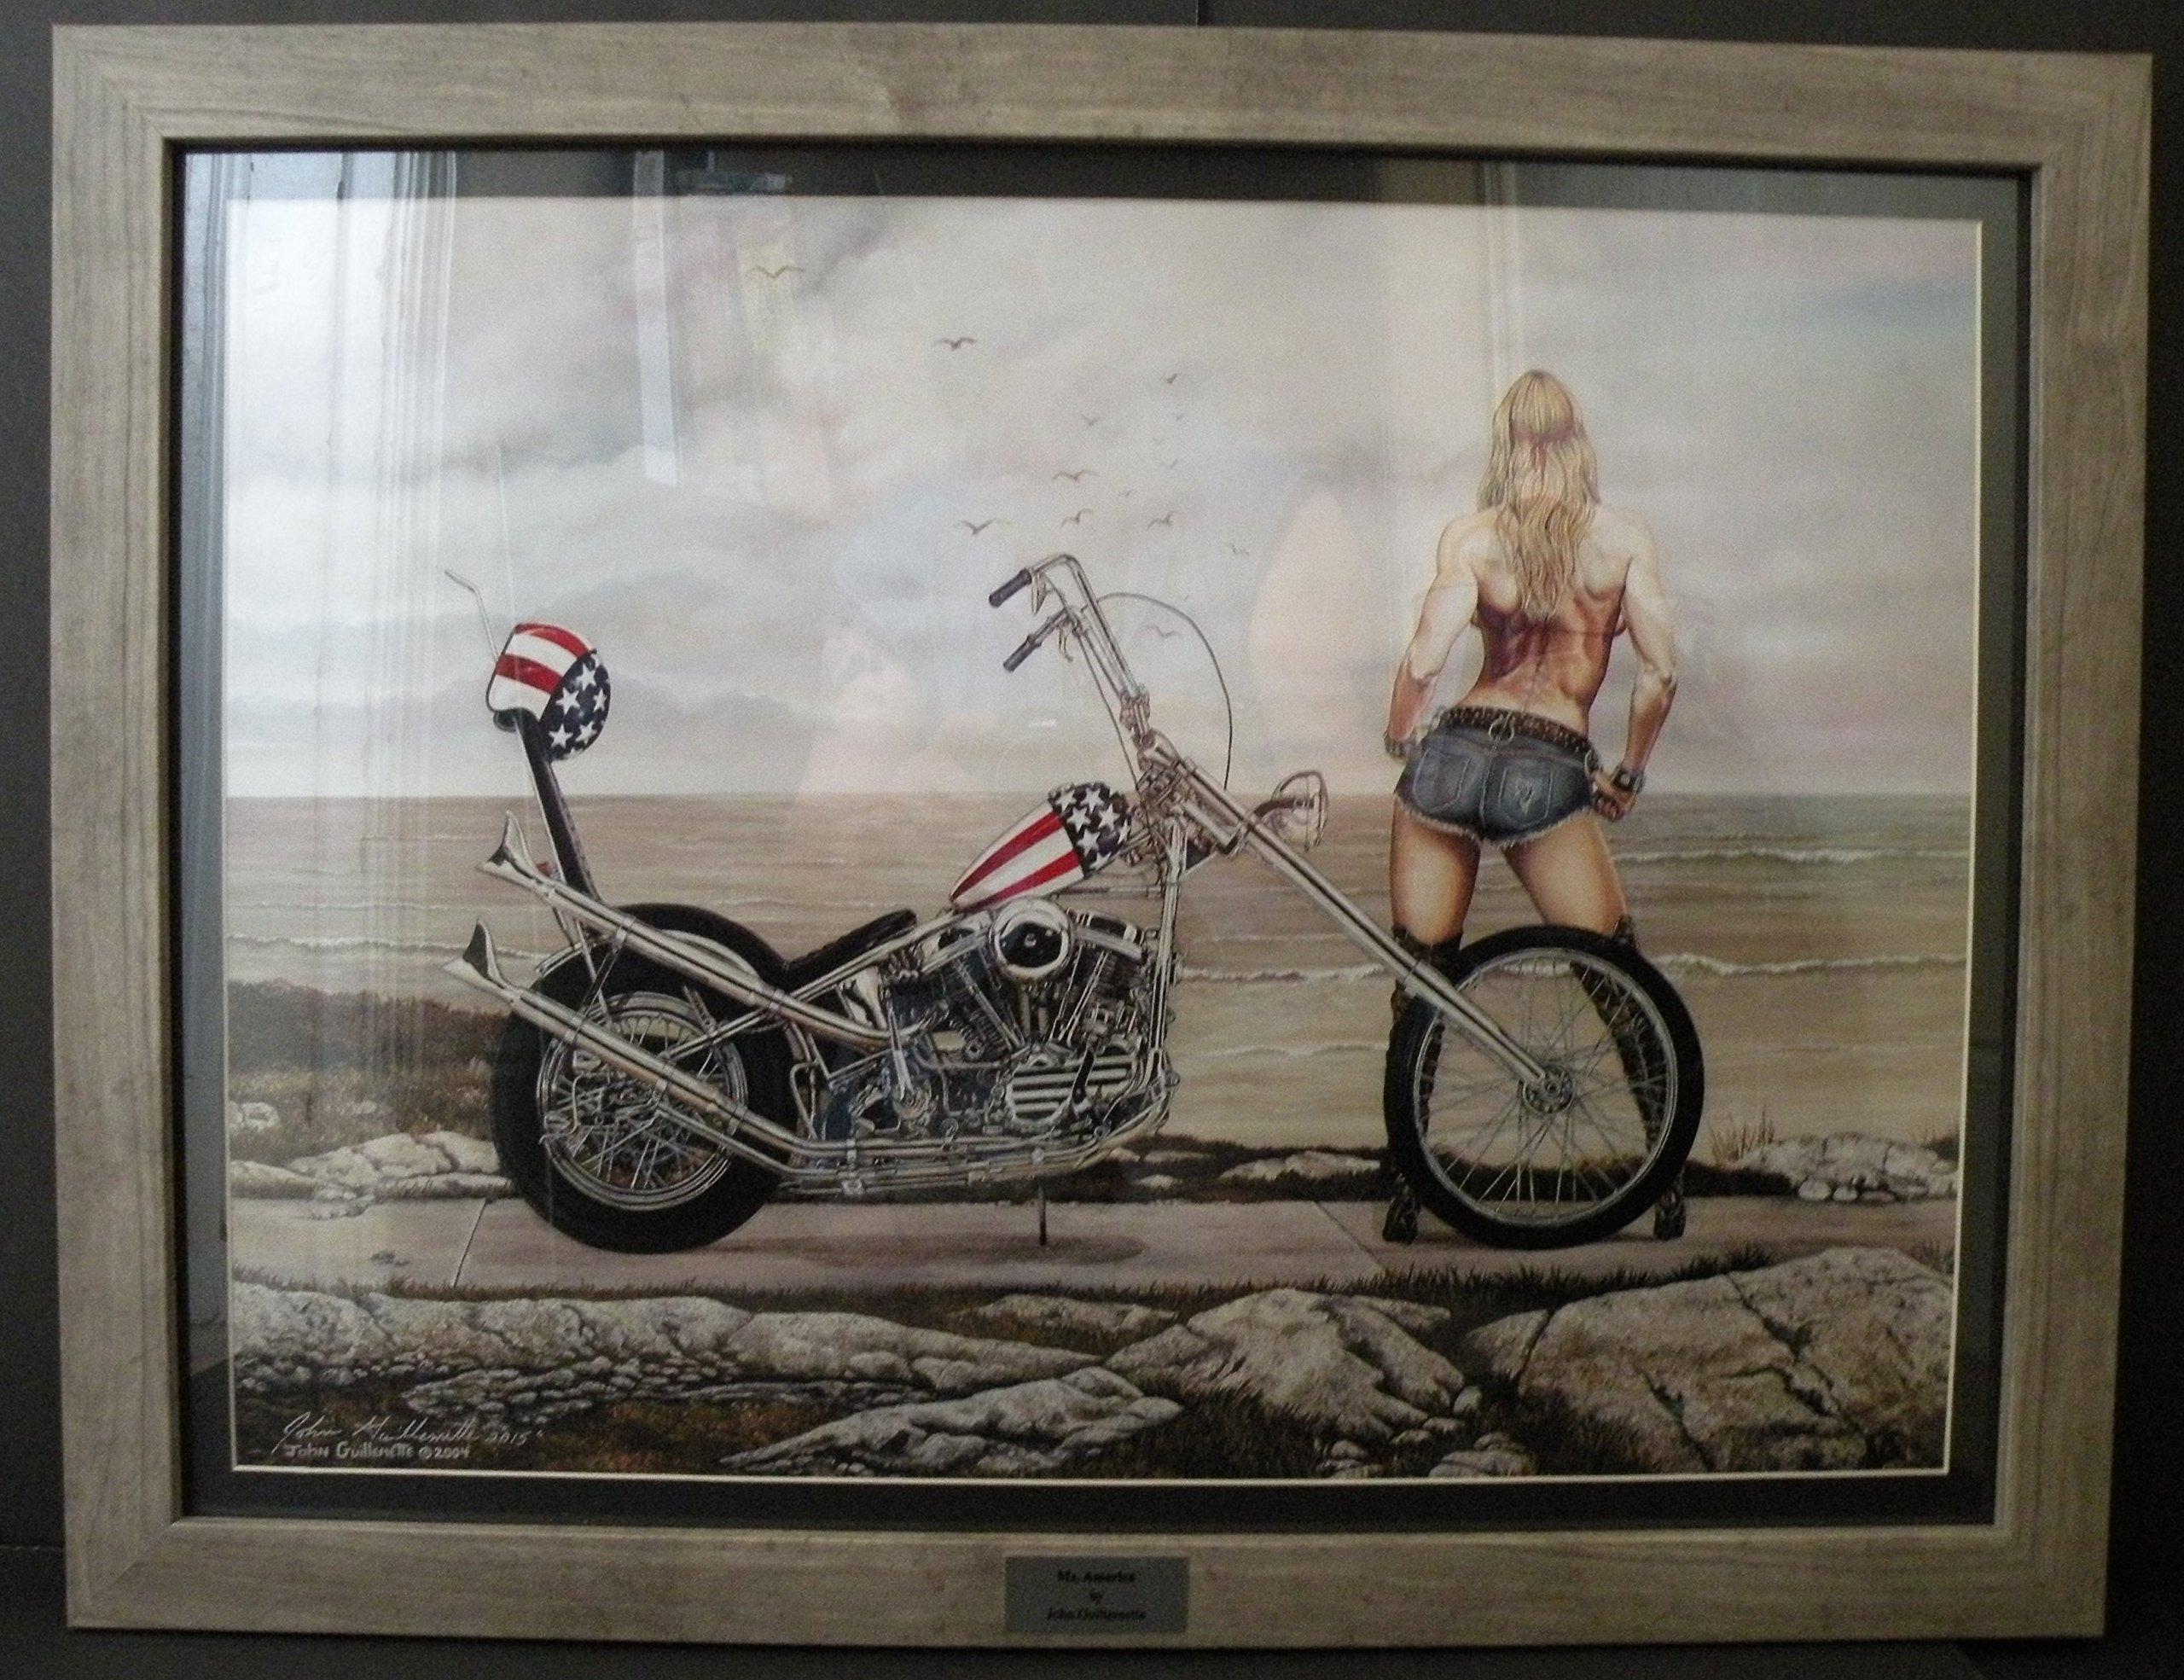 Easy Rider Harley Davidson Chopper Lady Biker Signed Custom Framed Motorcycle Art Print Seascape 18x24 Wall Art - Original Painting by John Guillemette